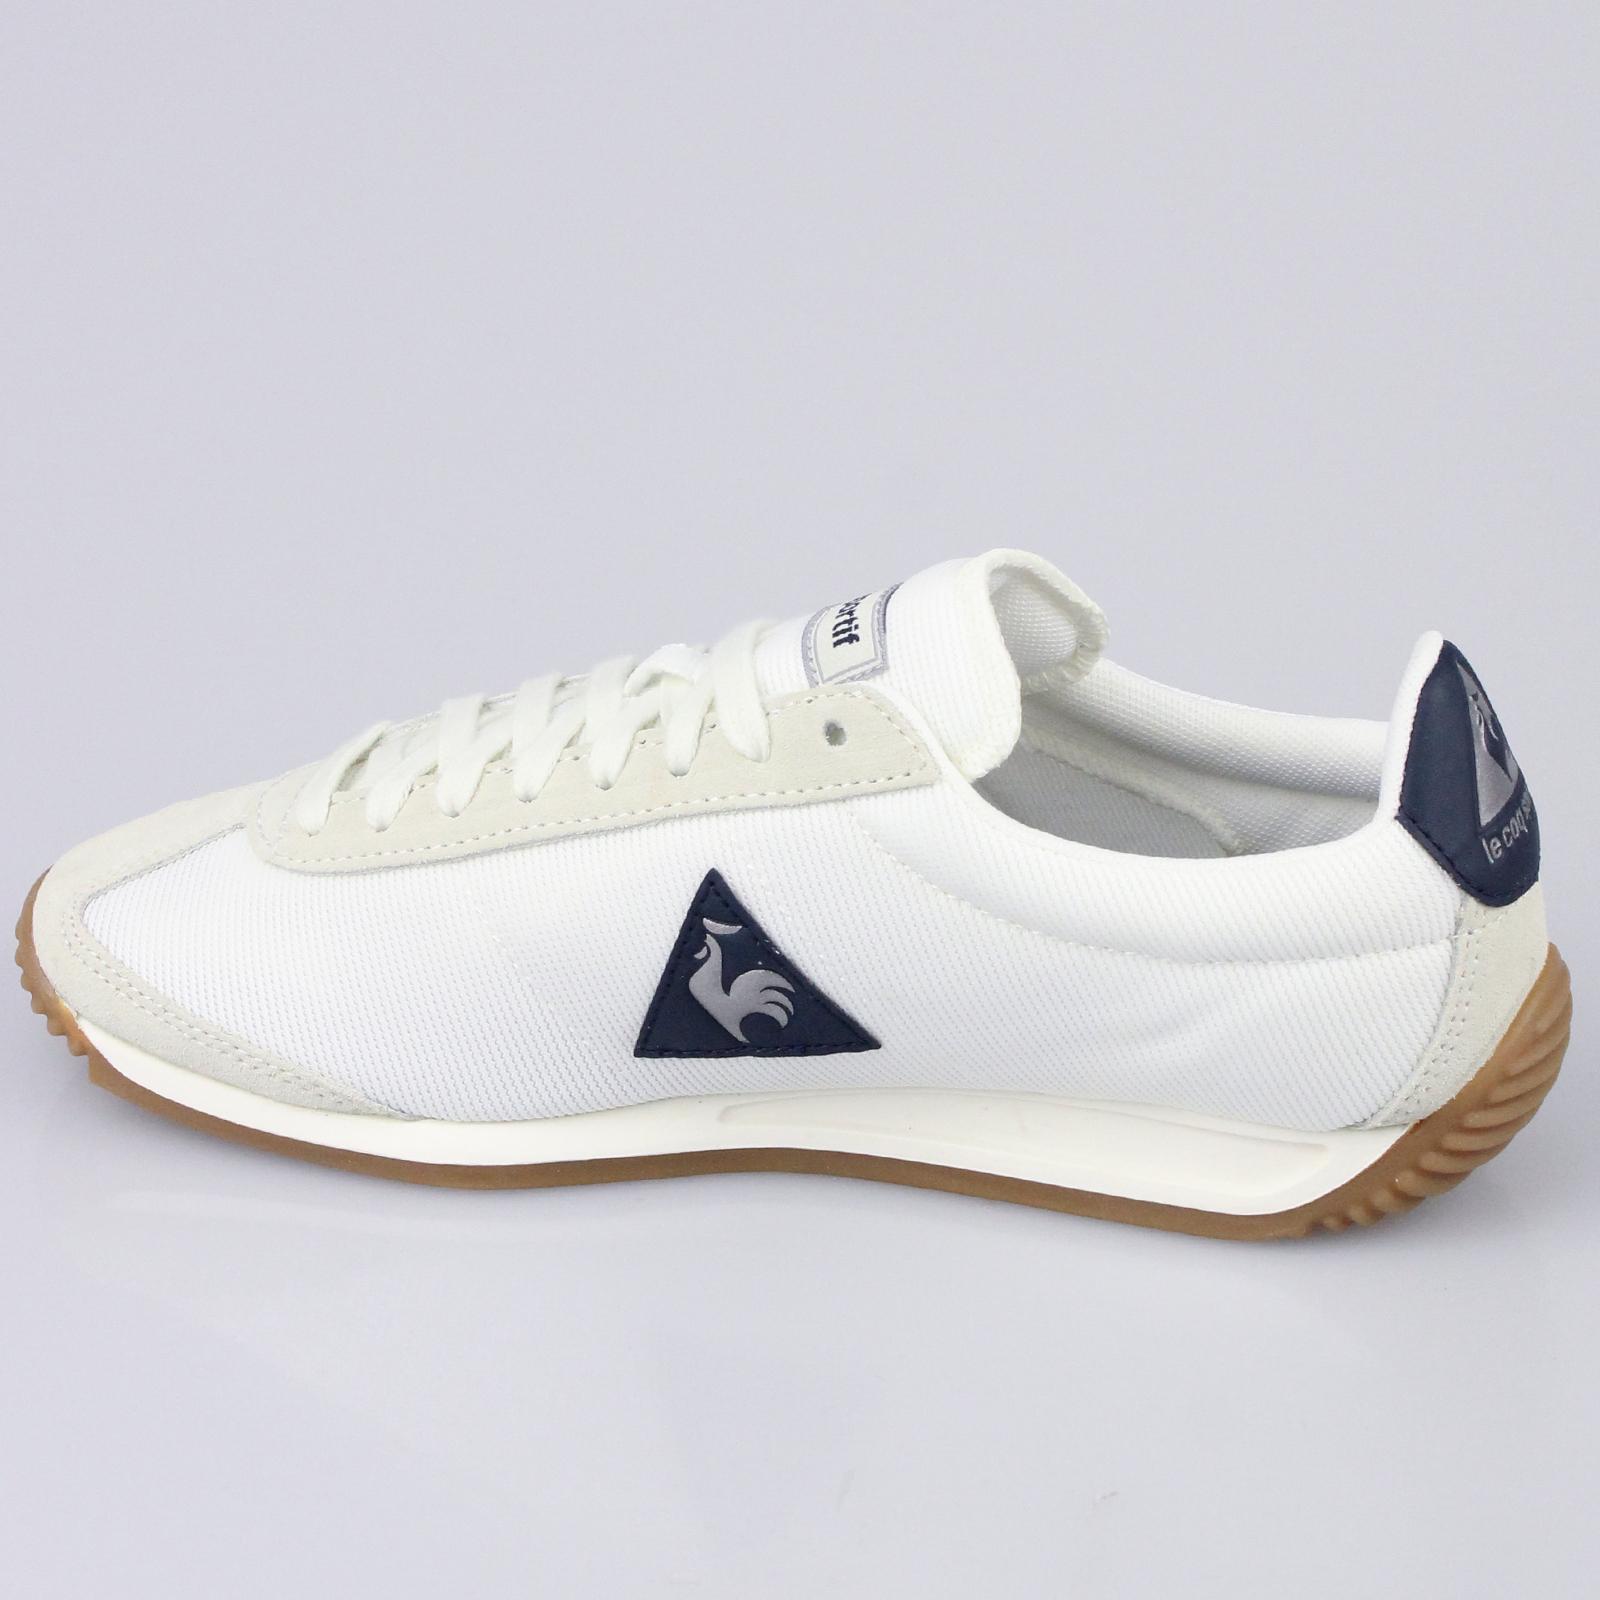 40ed0cde187f90 Previous; Next. 1; 2. Previous; Next. Pantofi sport barbati Le Coq Sportif  Quartz Nylon 1810722